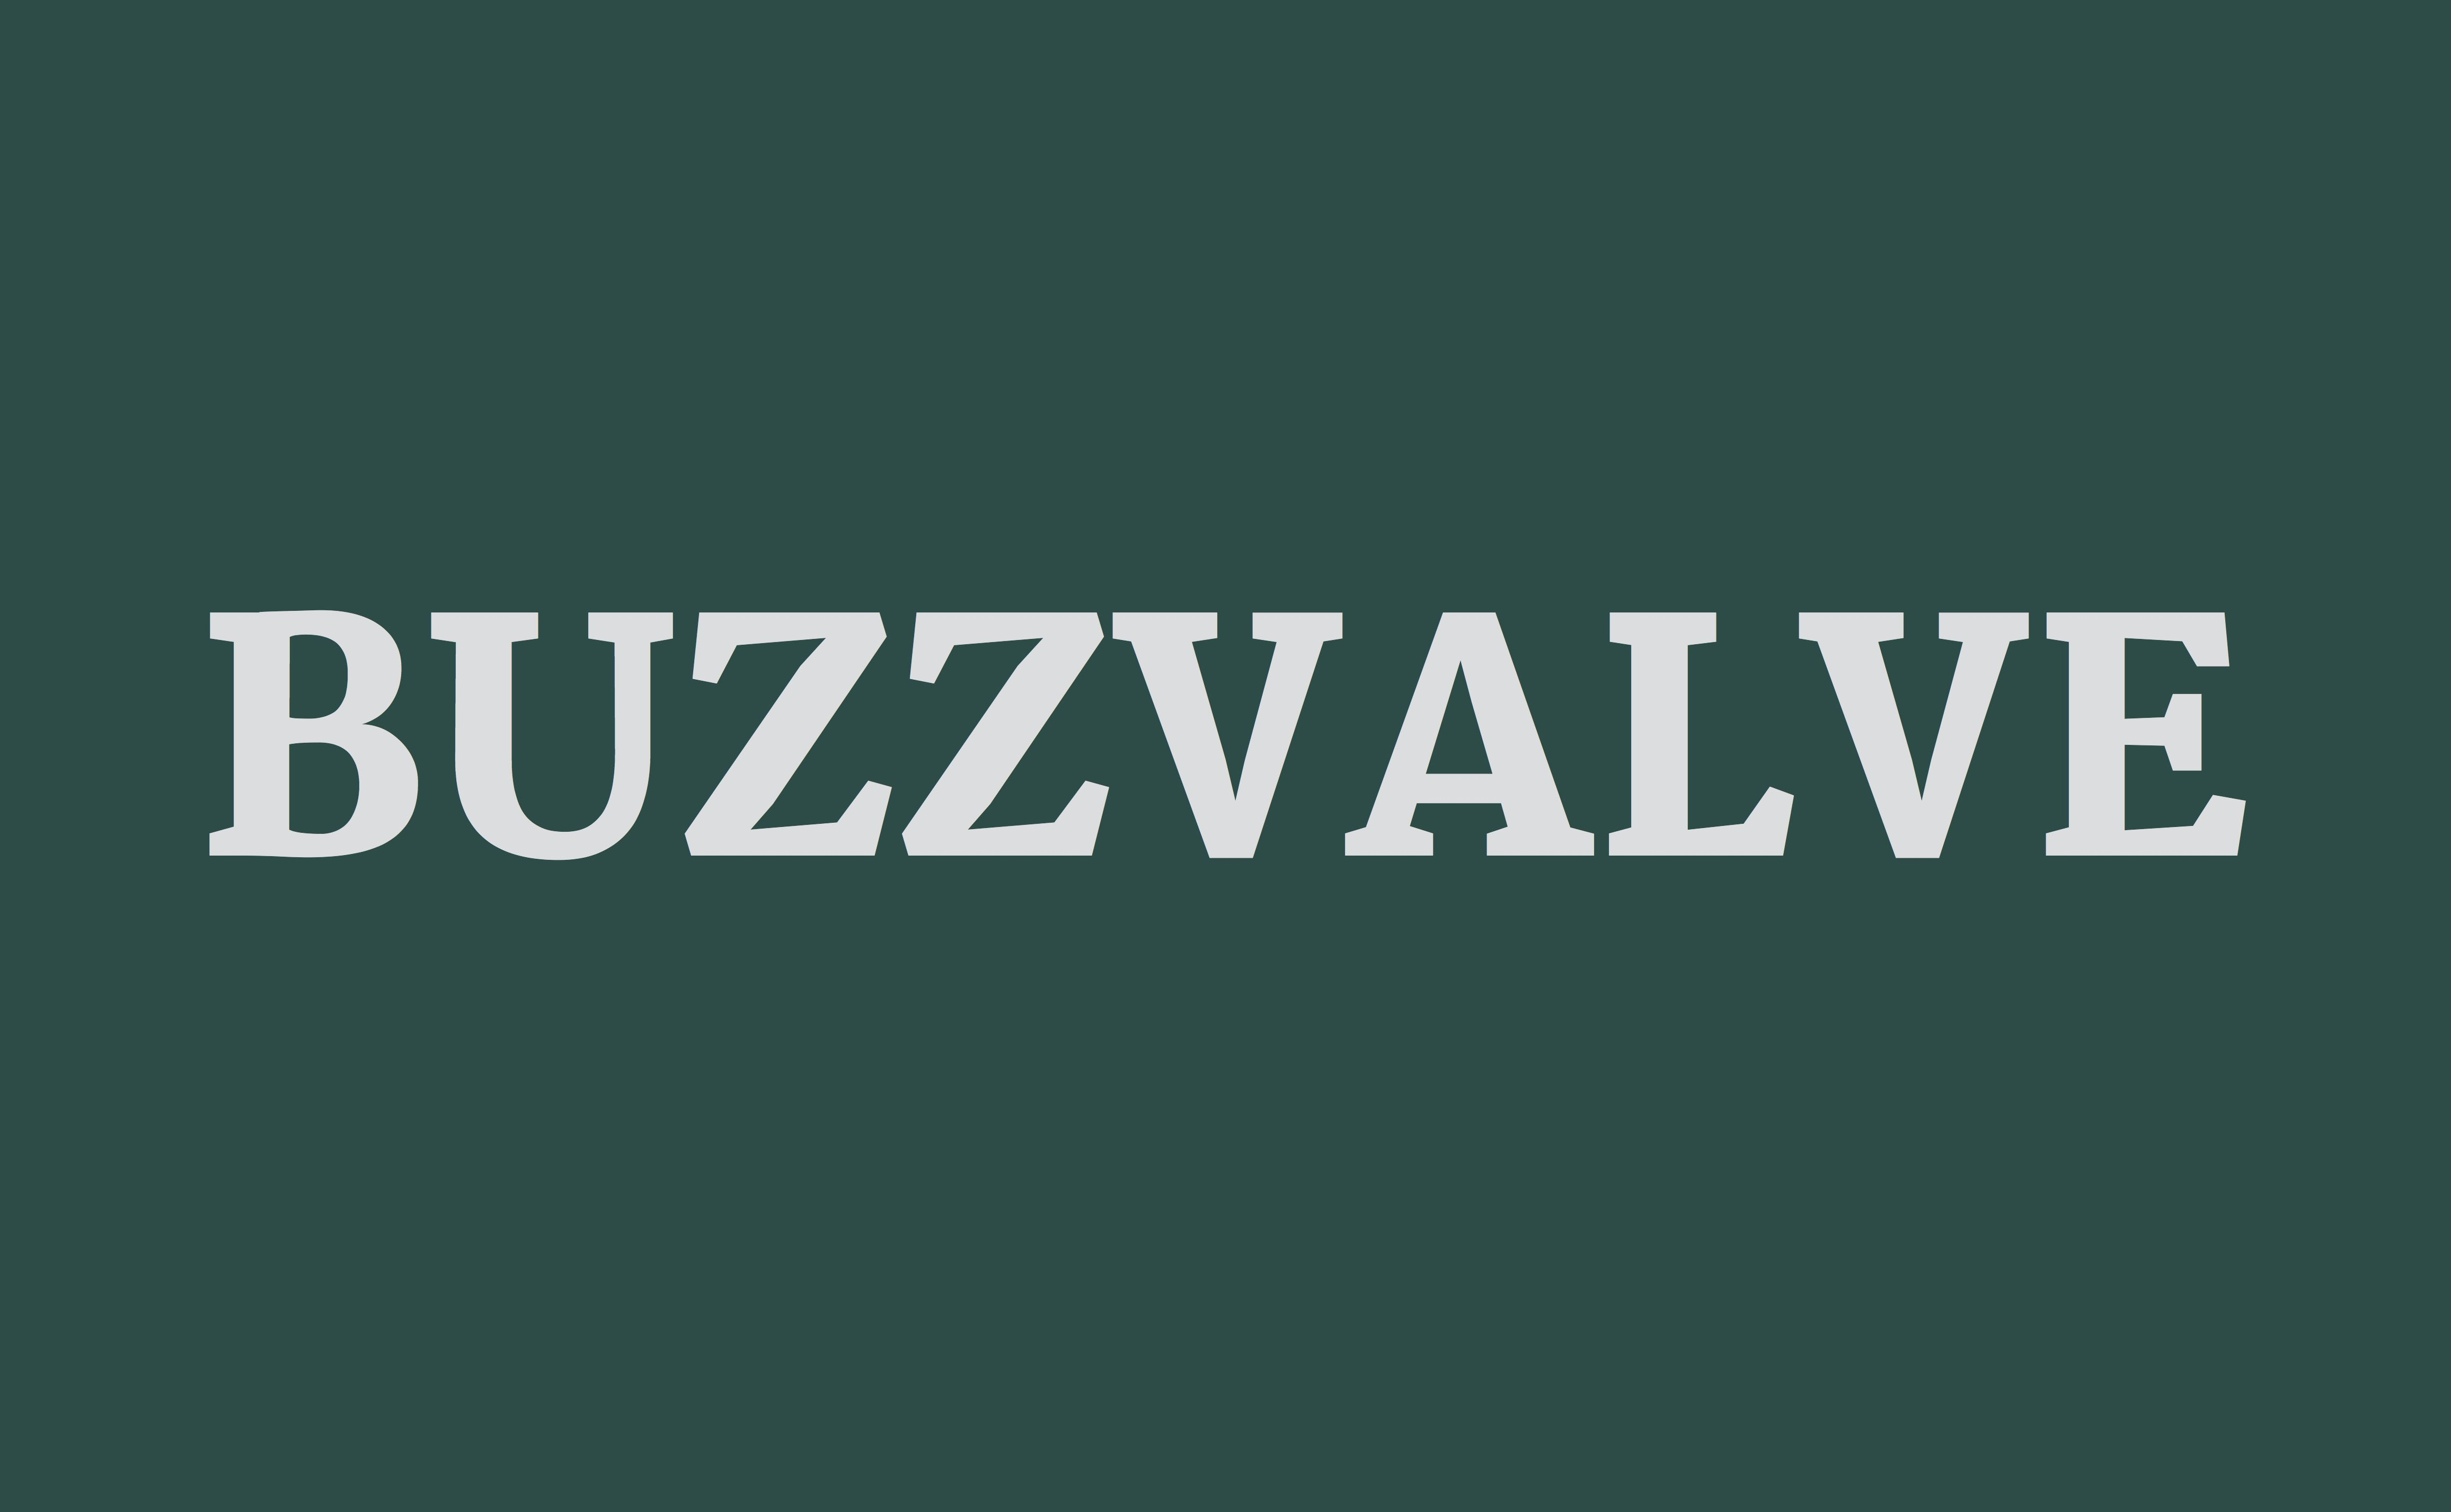 buzzvalve digital marketing agencies in India